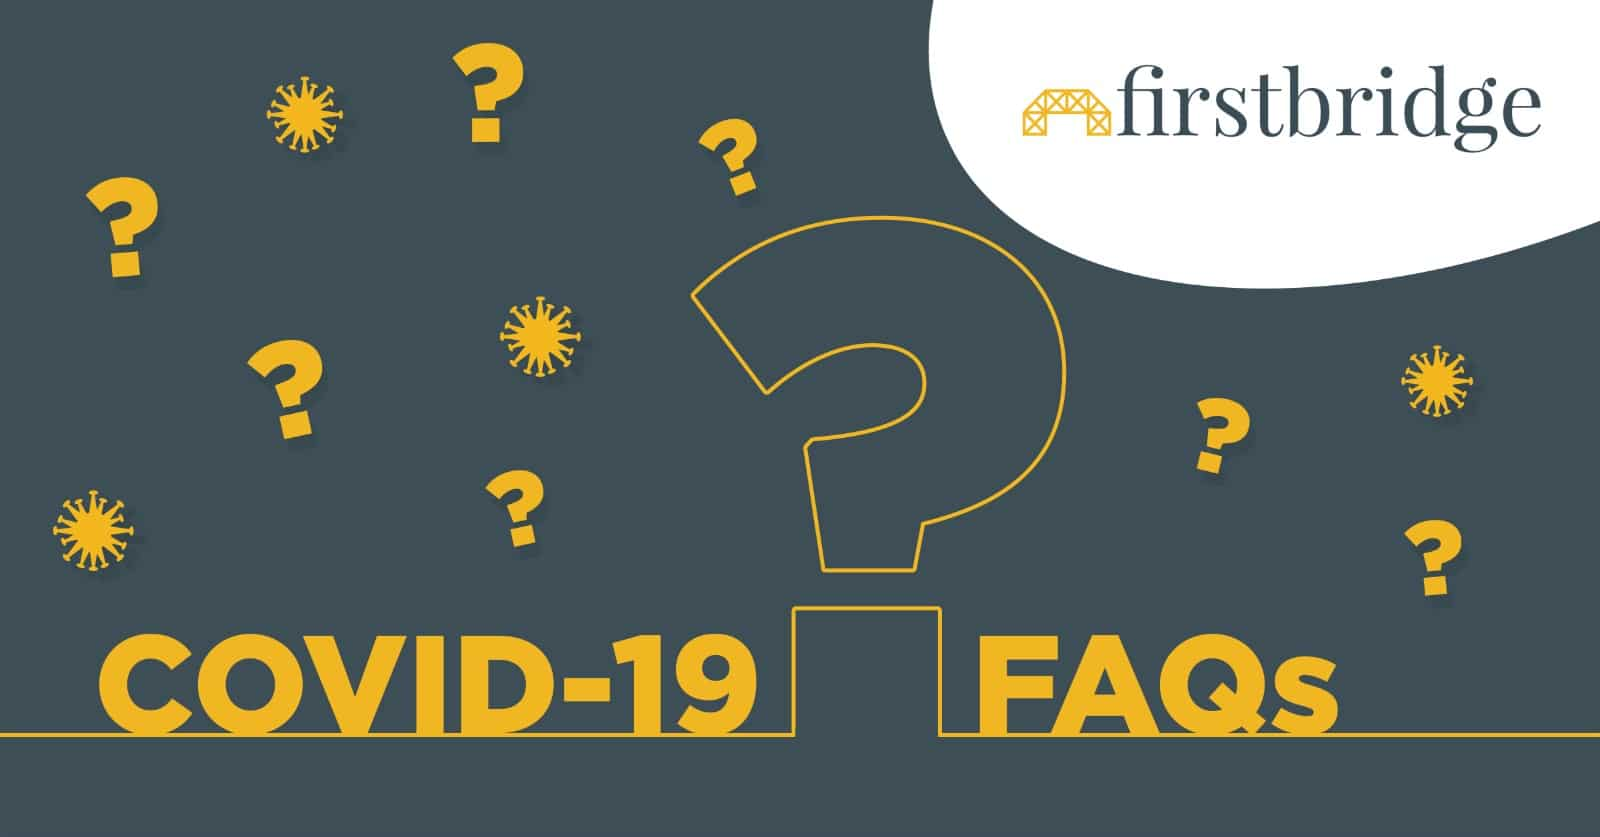 Firstbridge Covid-19 FAQ